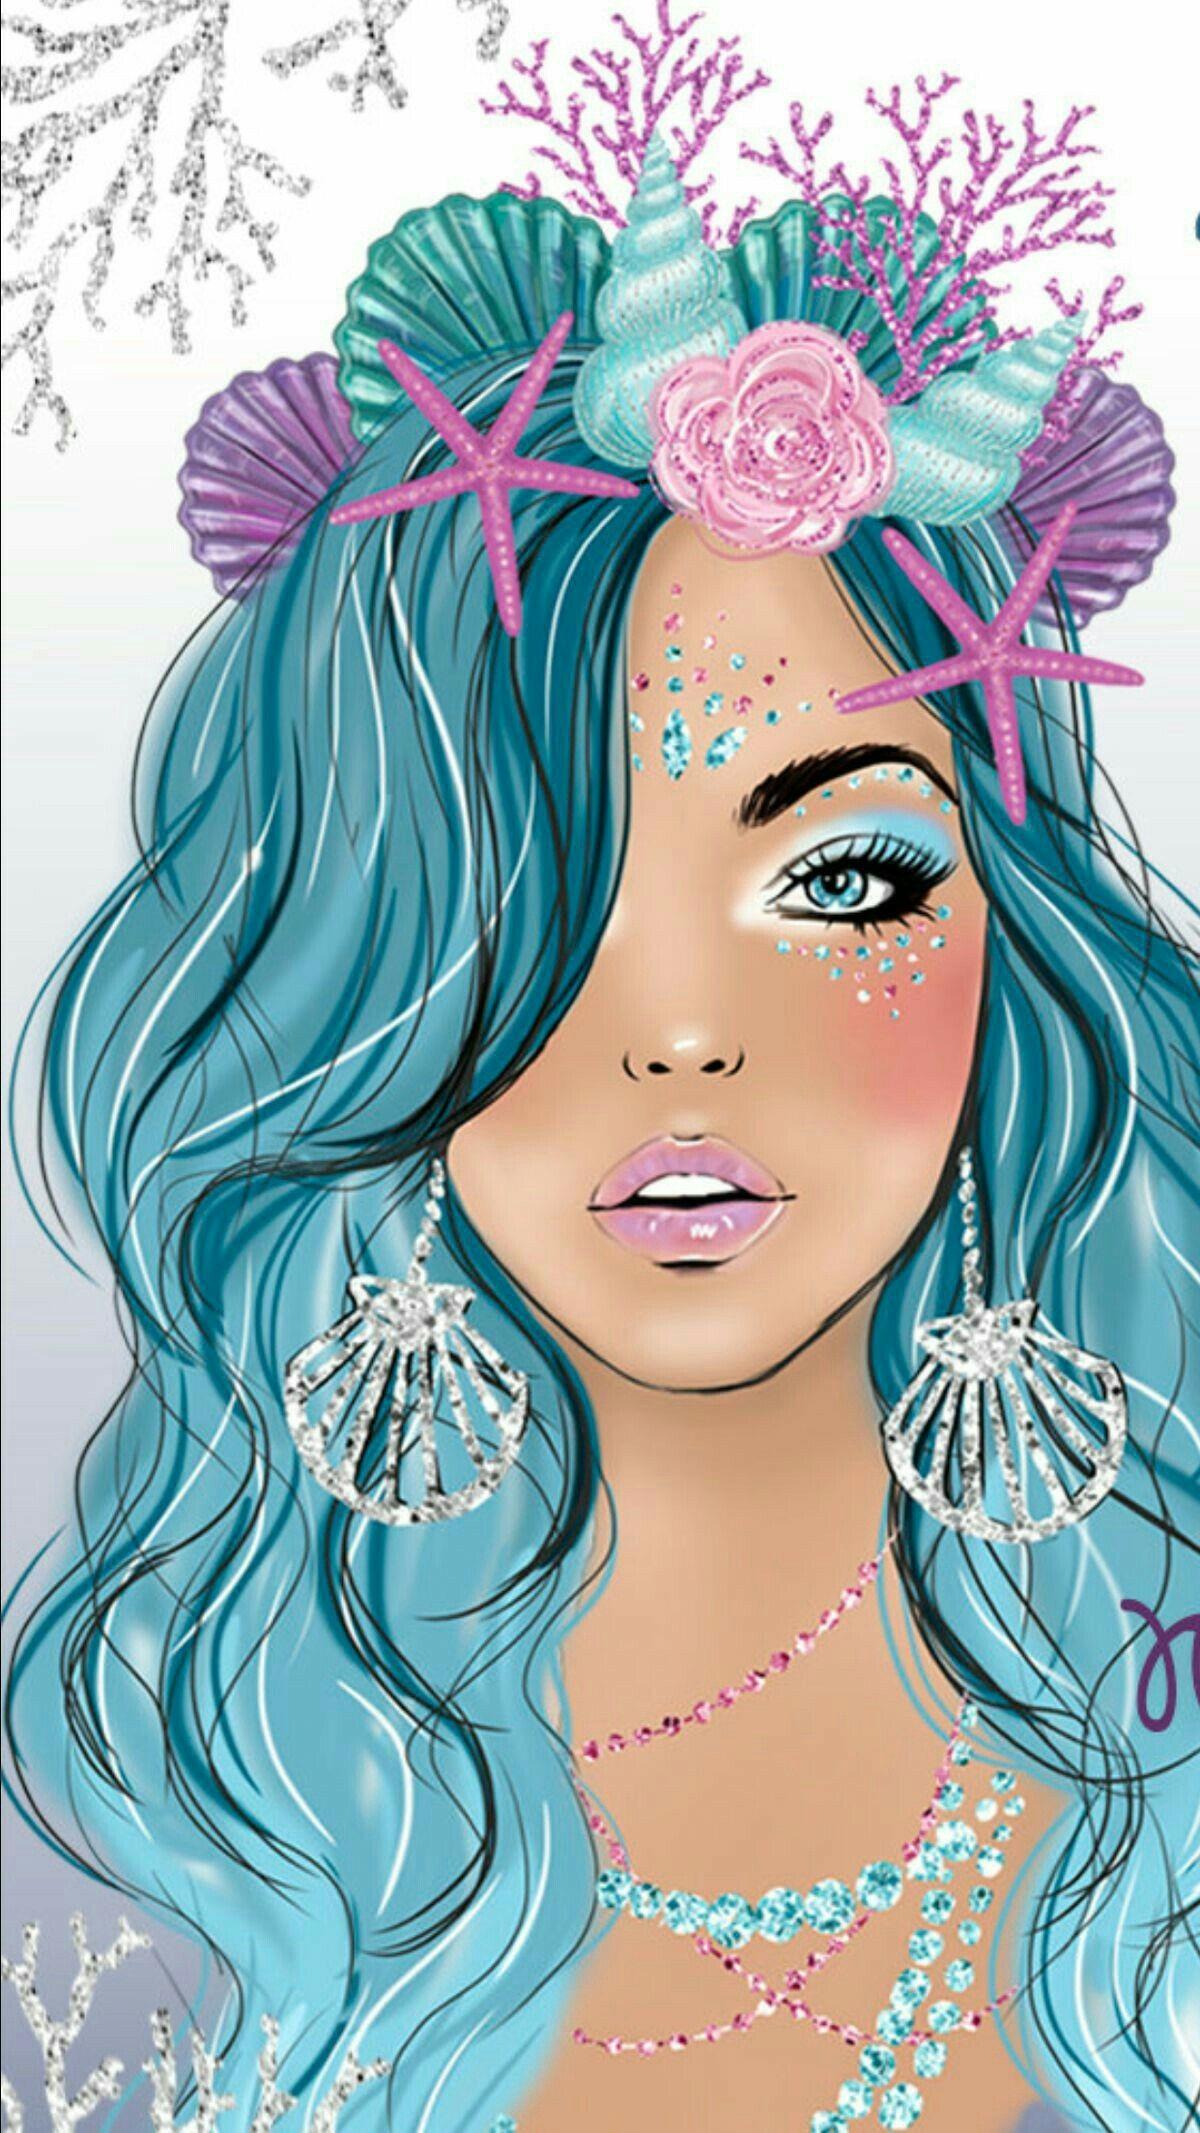 Unicorns And Mermaids Cute Wallpapers Mermaid Wallpapers Cute Wallpaper Mermaid 1200x2133 Download Hd Wallpaper Wallpapertip